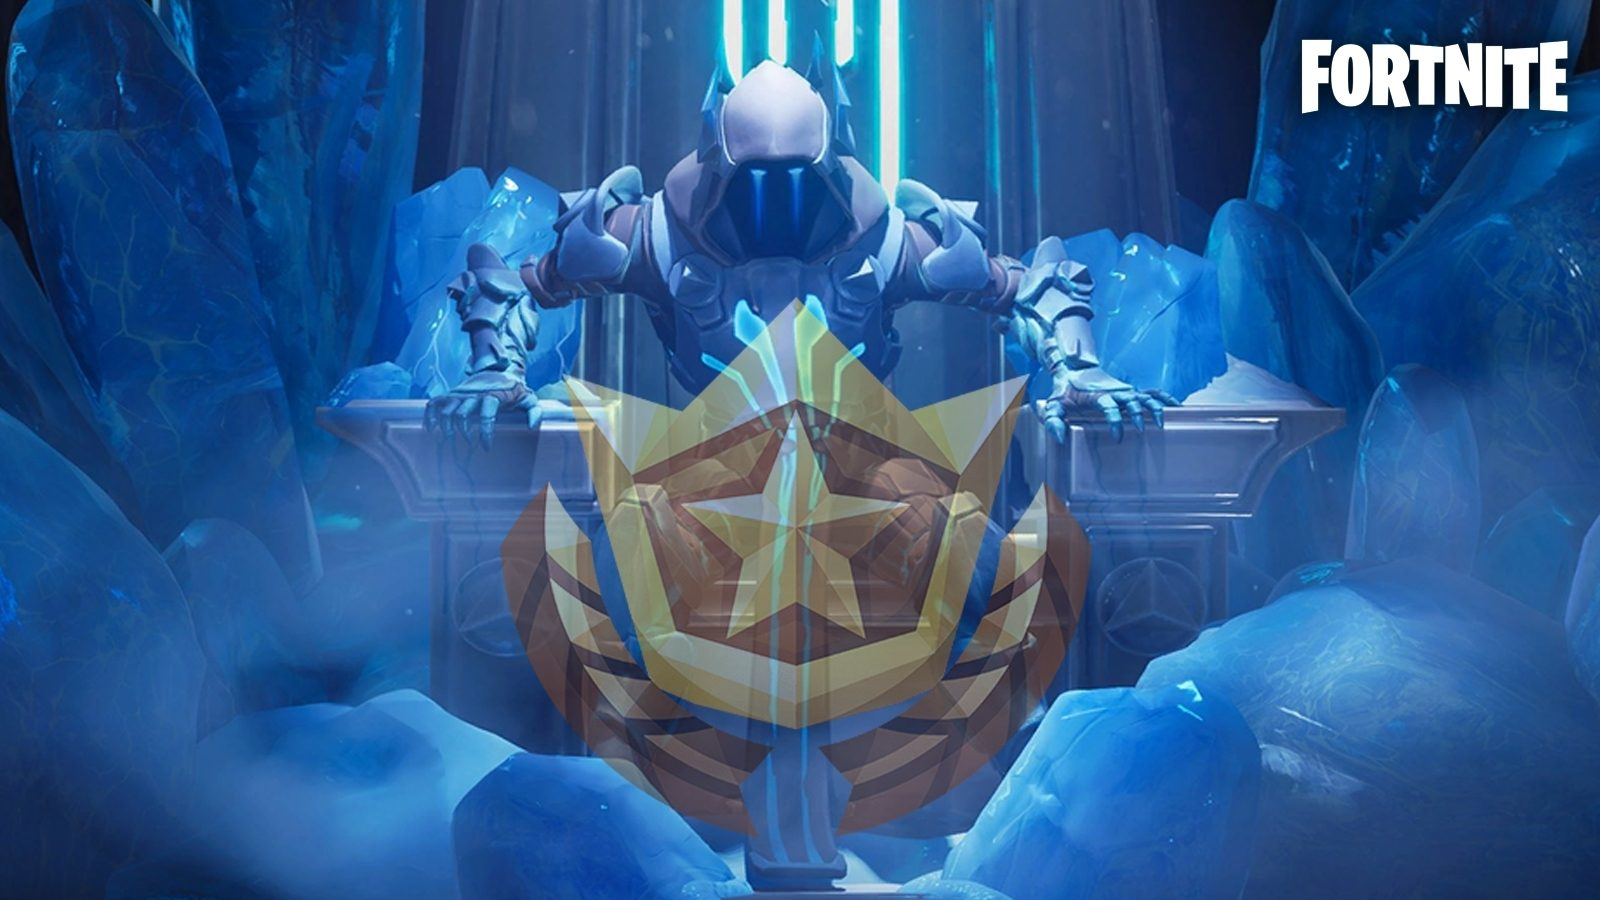 Week 7 Banner In Fortnite 8 How To Find Secret Fortnite Battle Star For Week 7 Season 7 Snowfall Challenge Location And Guide Fortnite Fyi